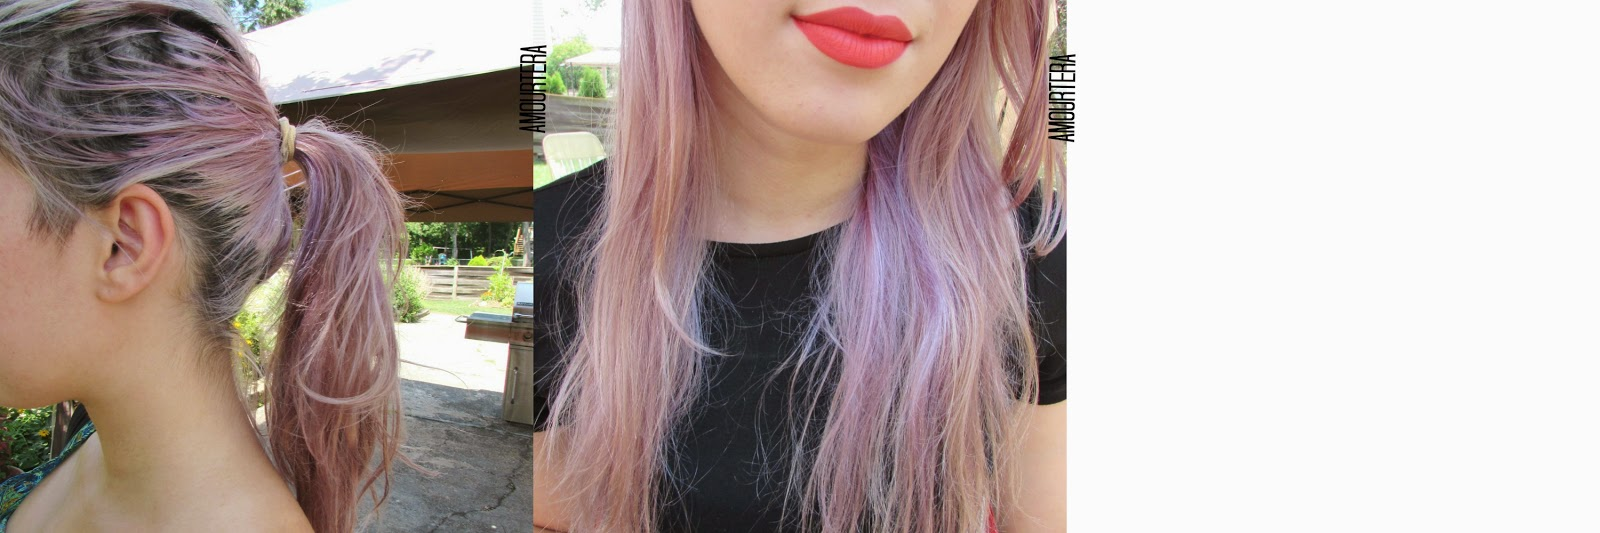 Amourtera Purple Hair Care Update And Faq